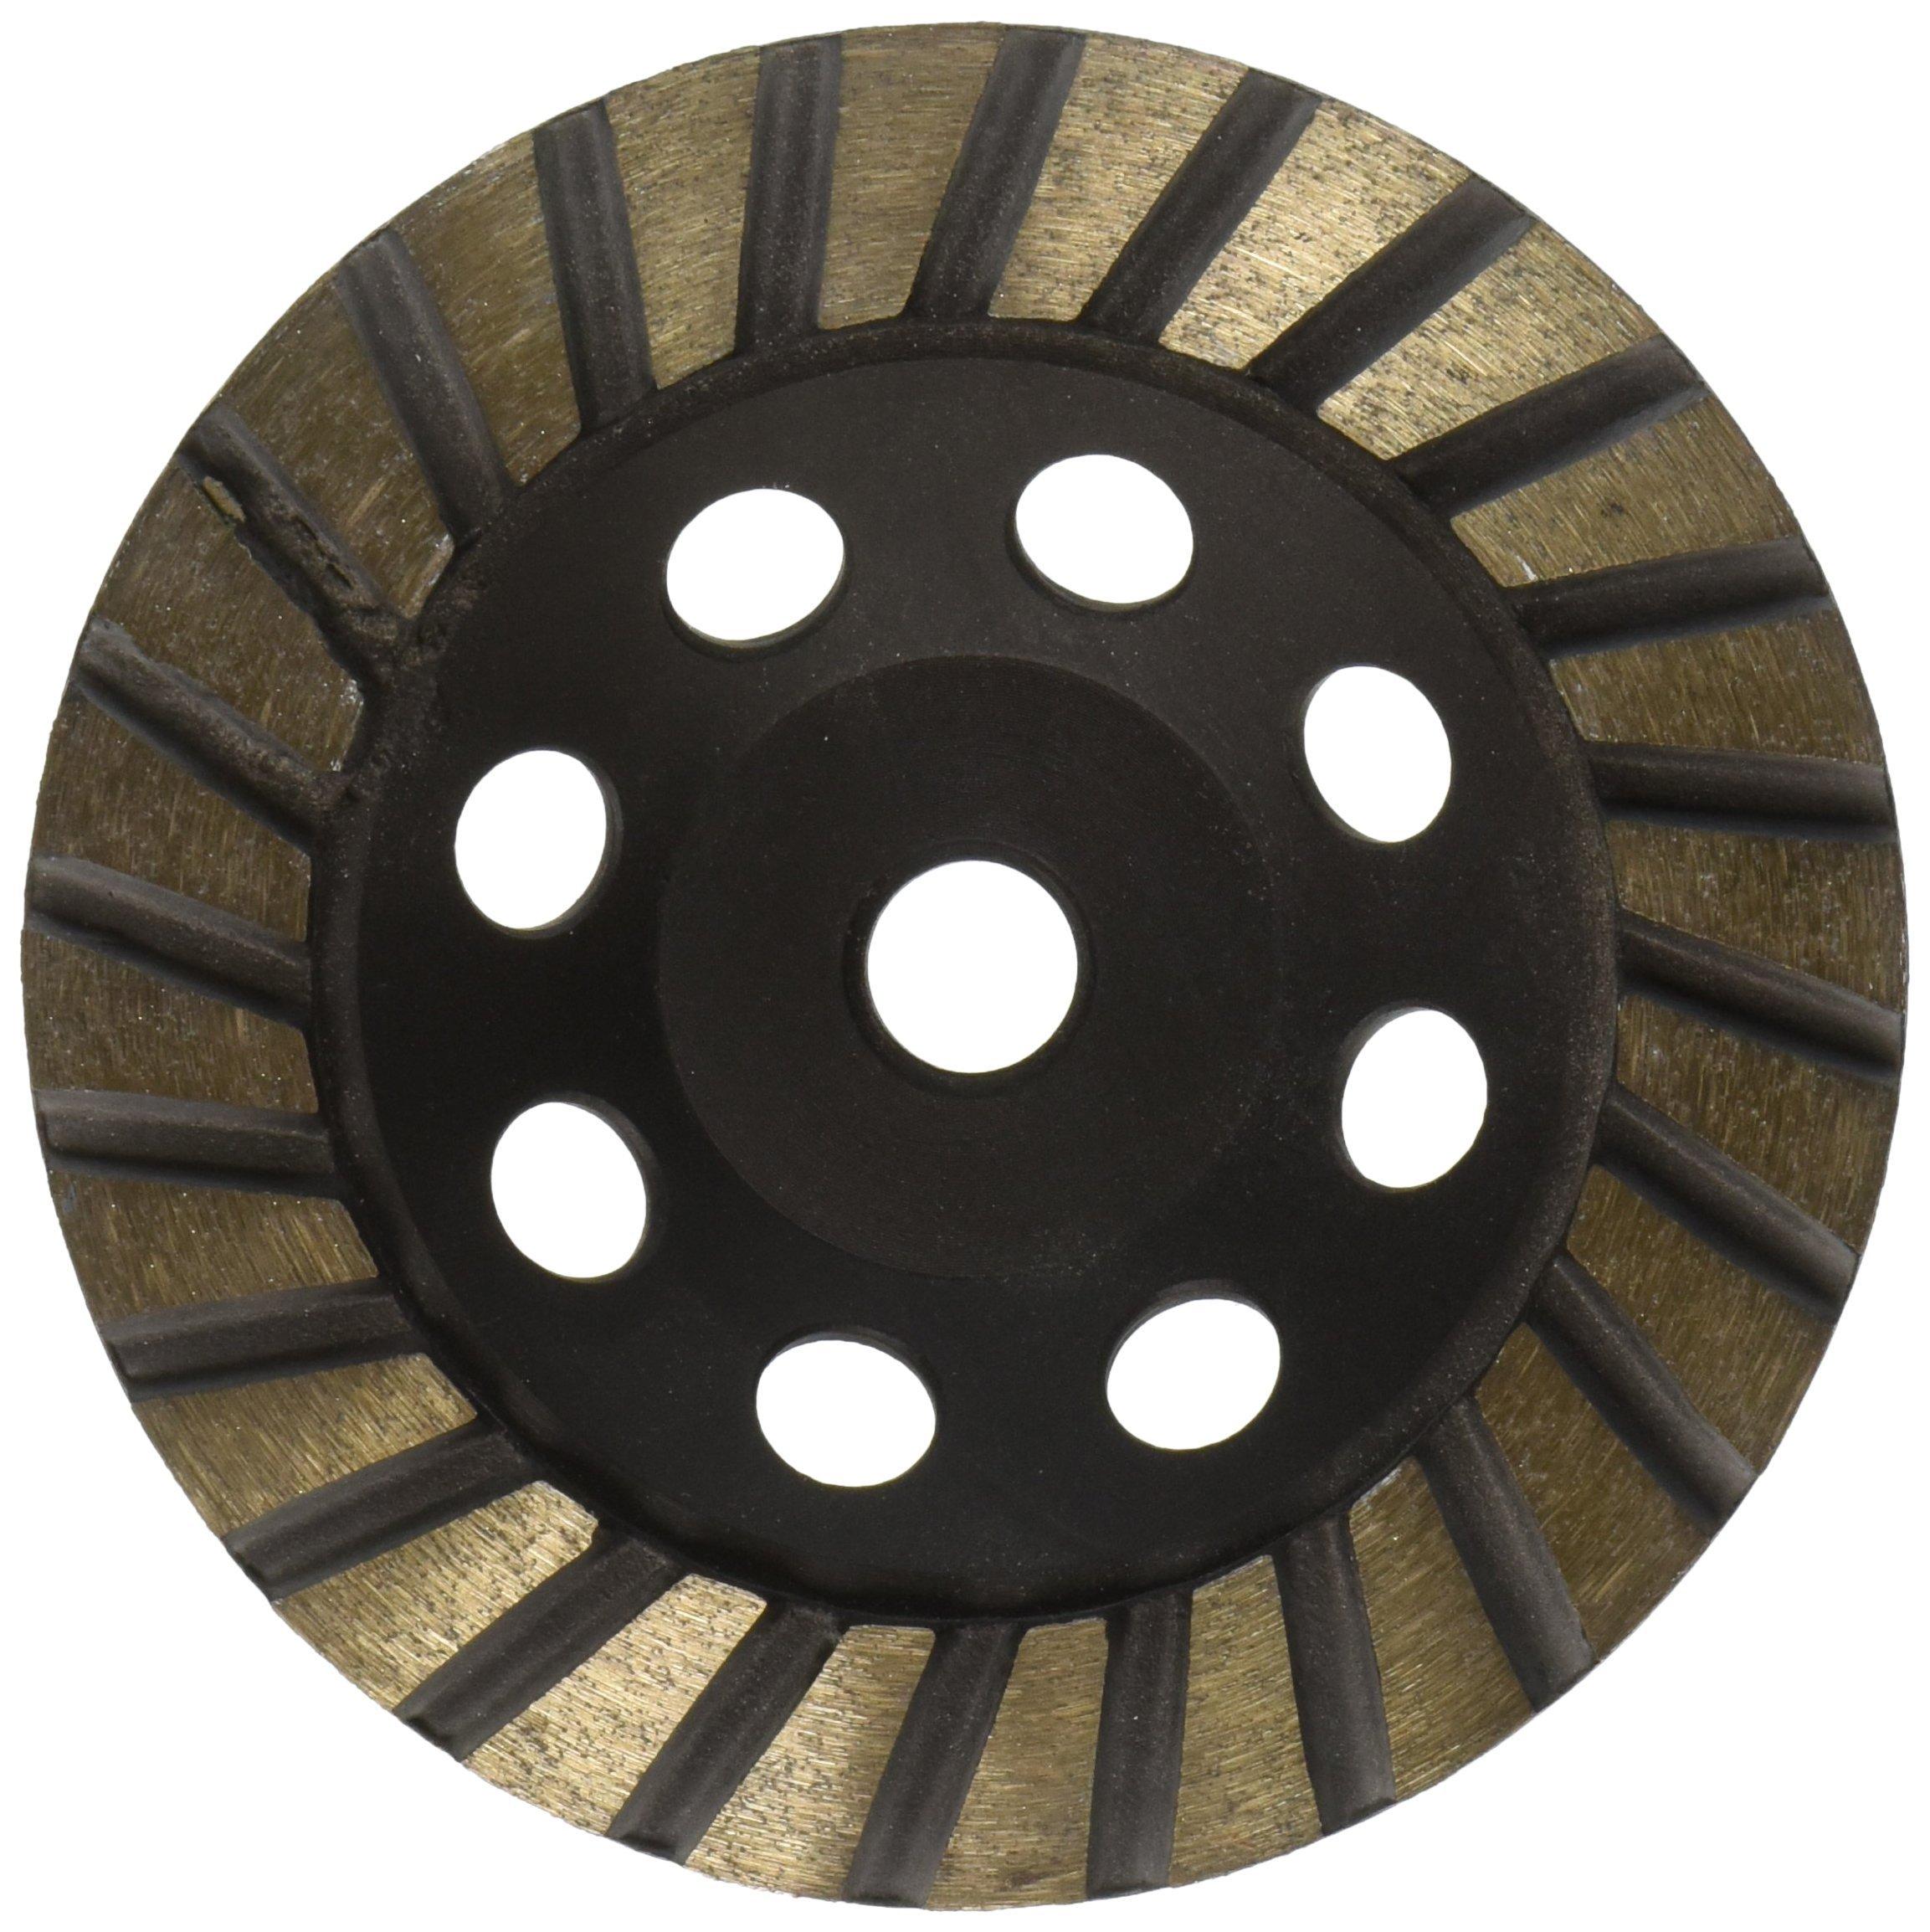 Toolocity 5tcw0058sf 5-Inch Diamond Turbo Cup Wheel Steel Based, Fine